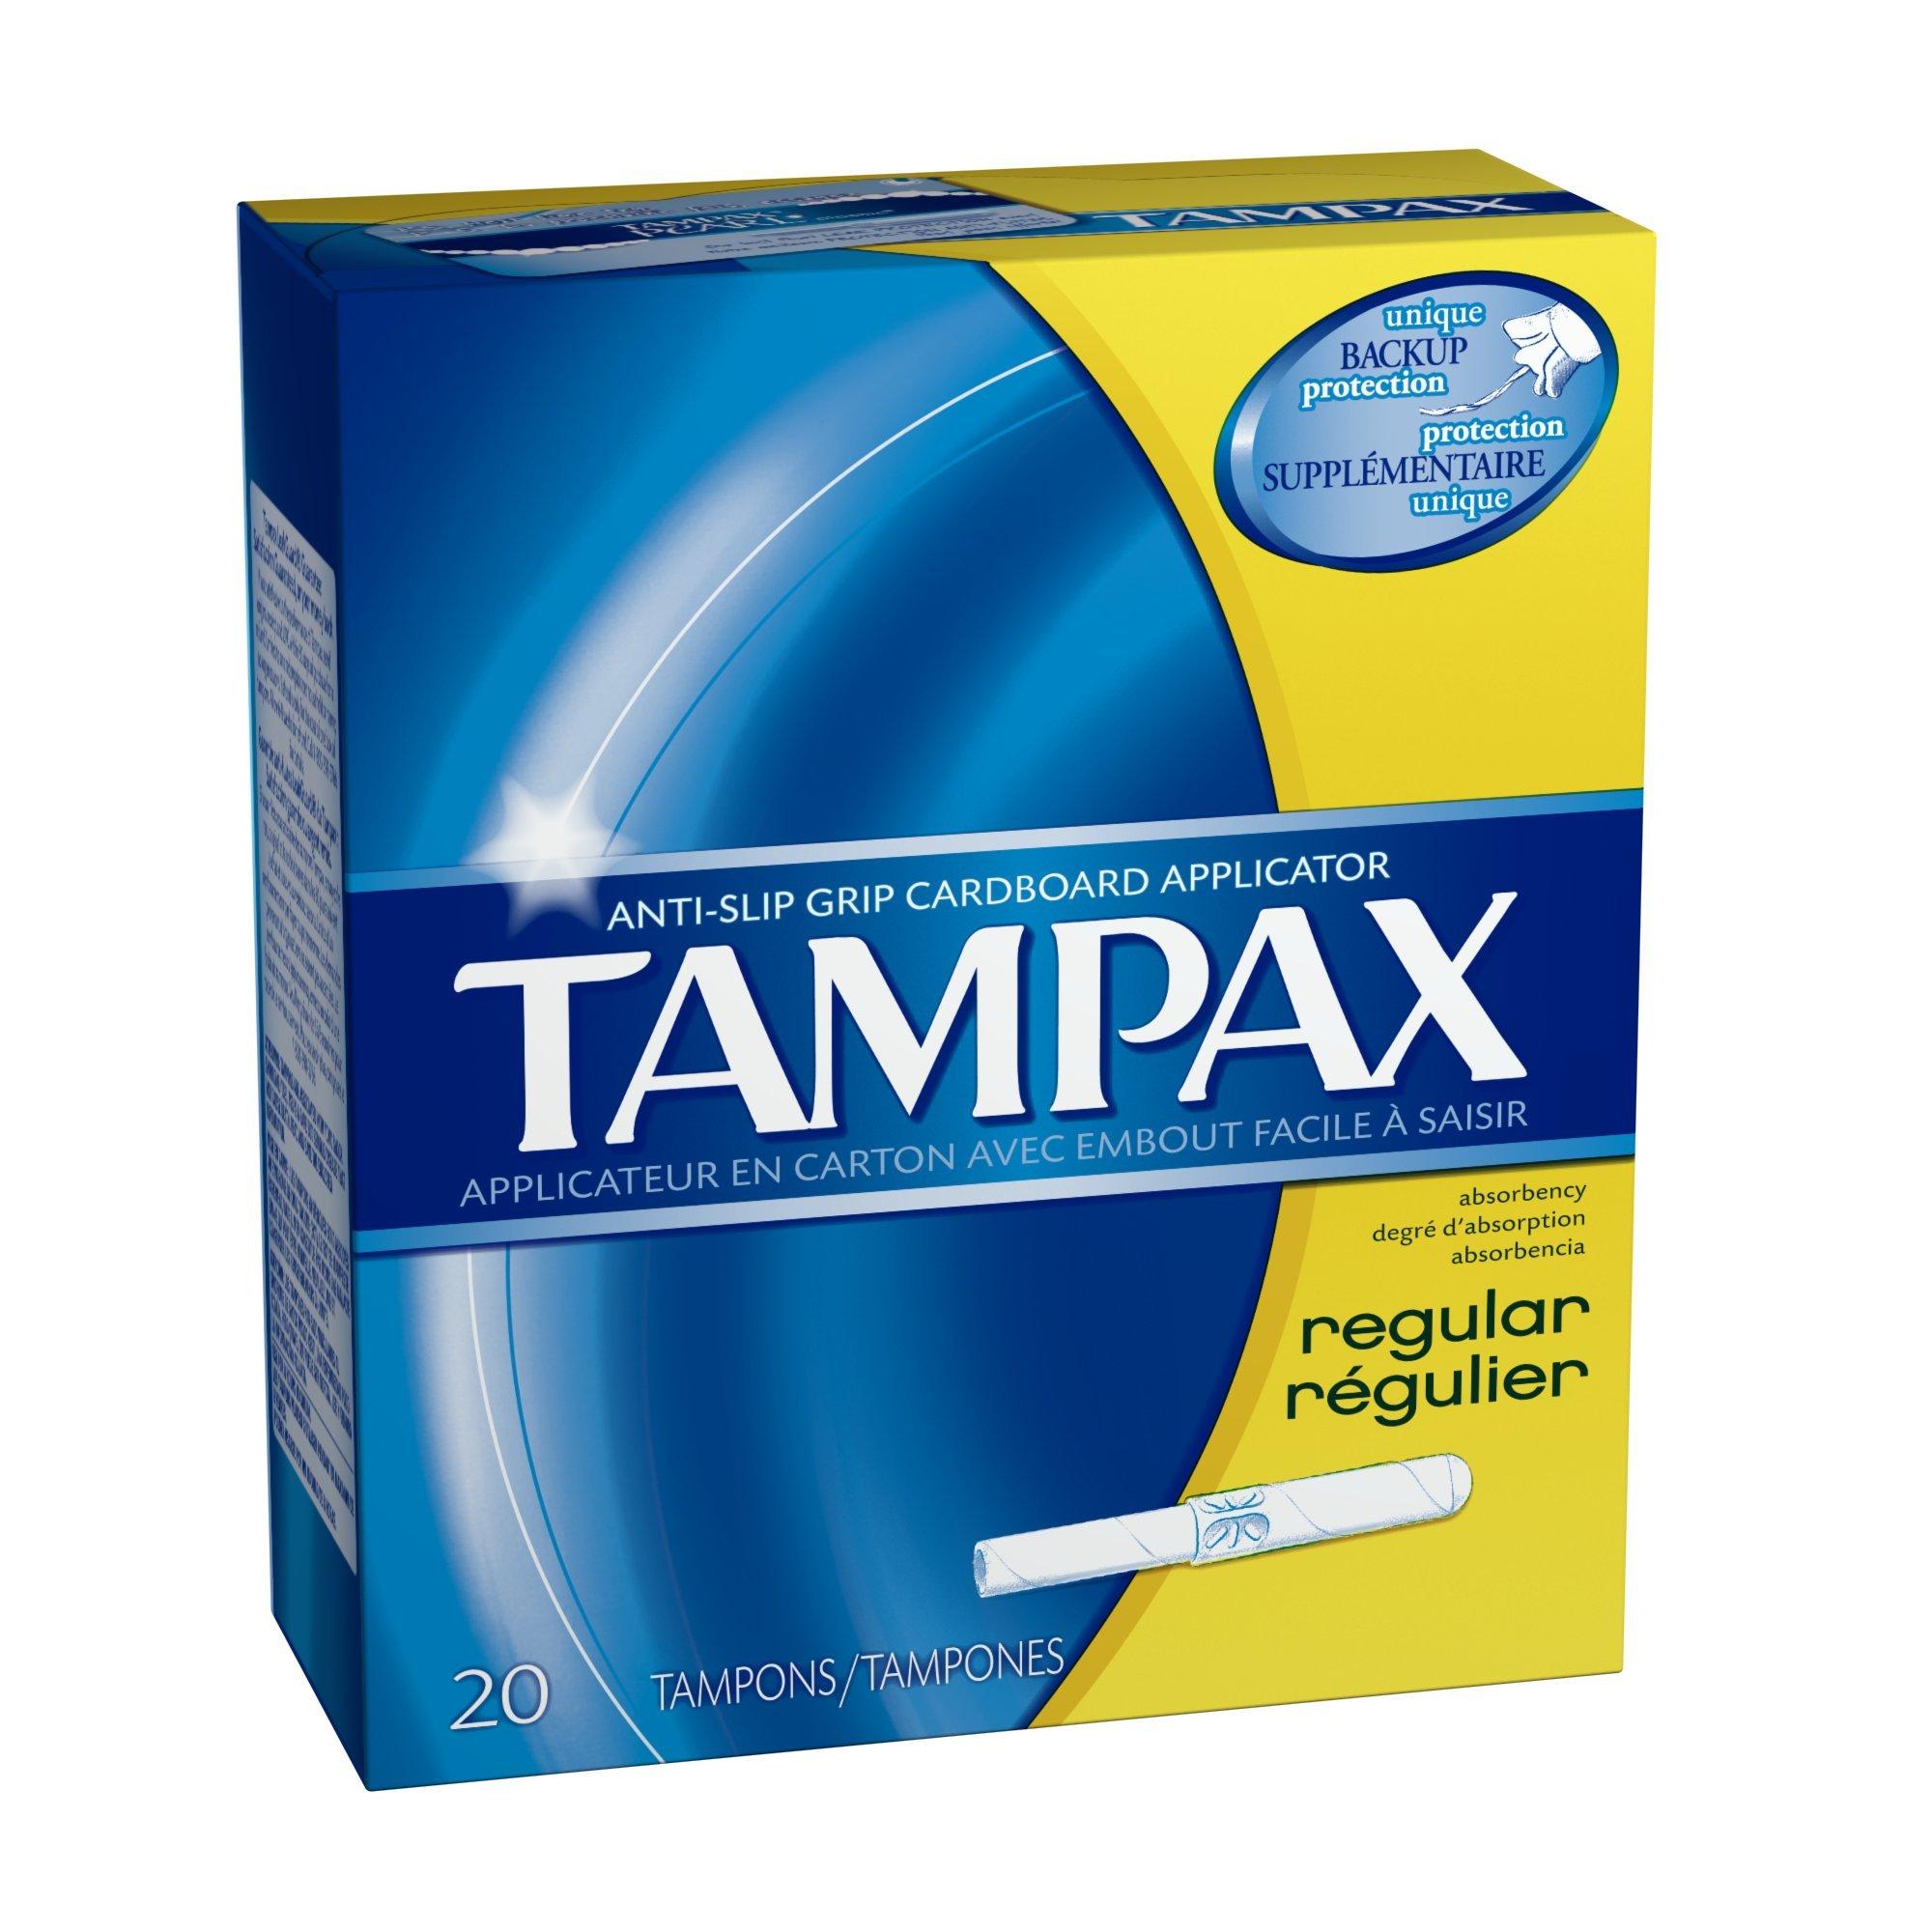 Tampax Cardboard Applicator, Regular Absorbency Tampons 20 CT (Pack of 18)